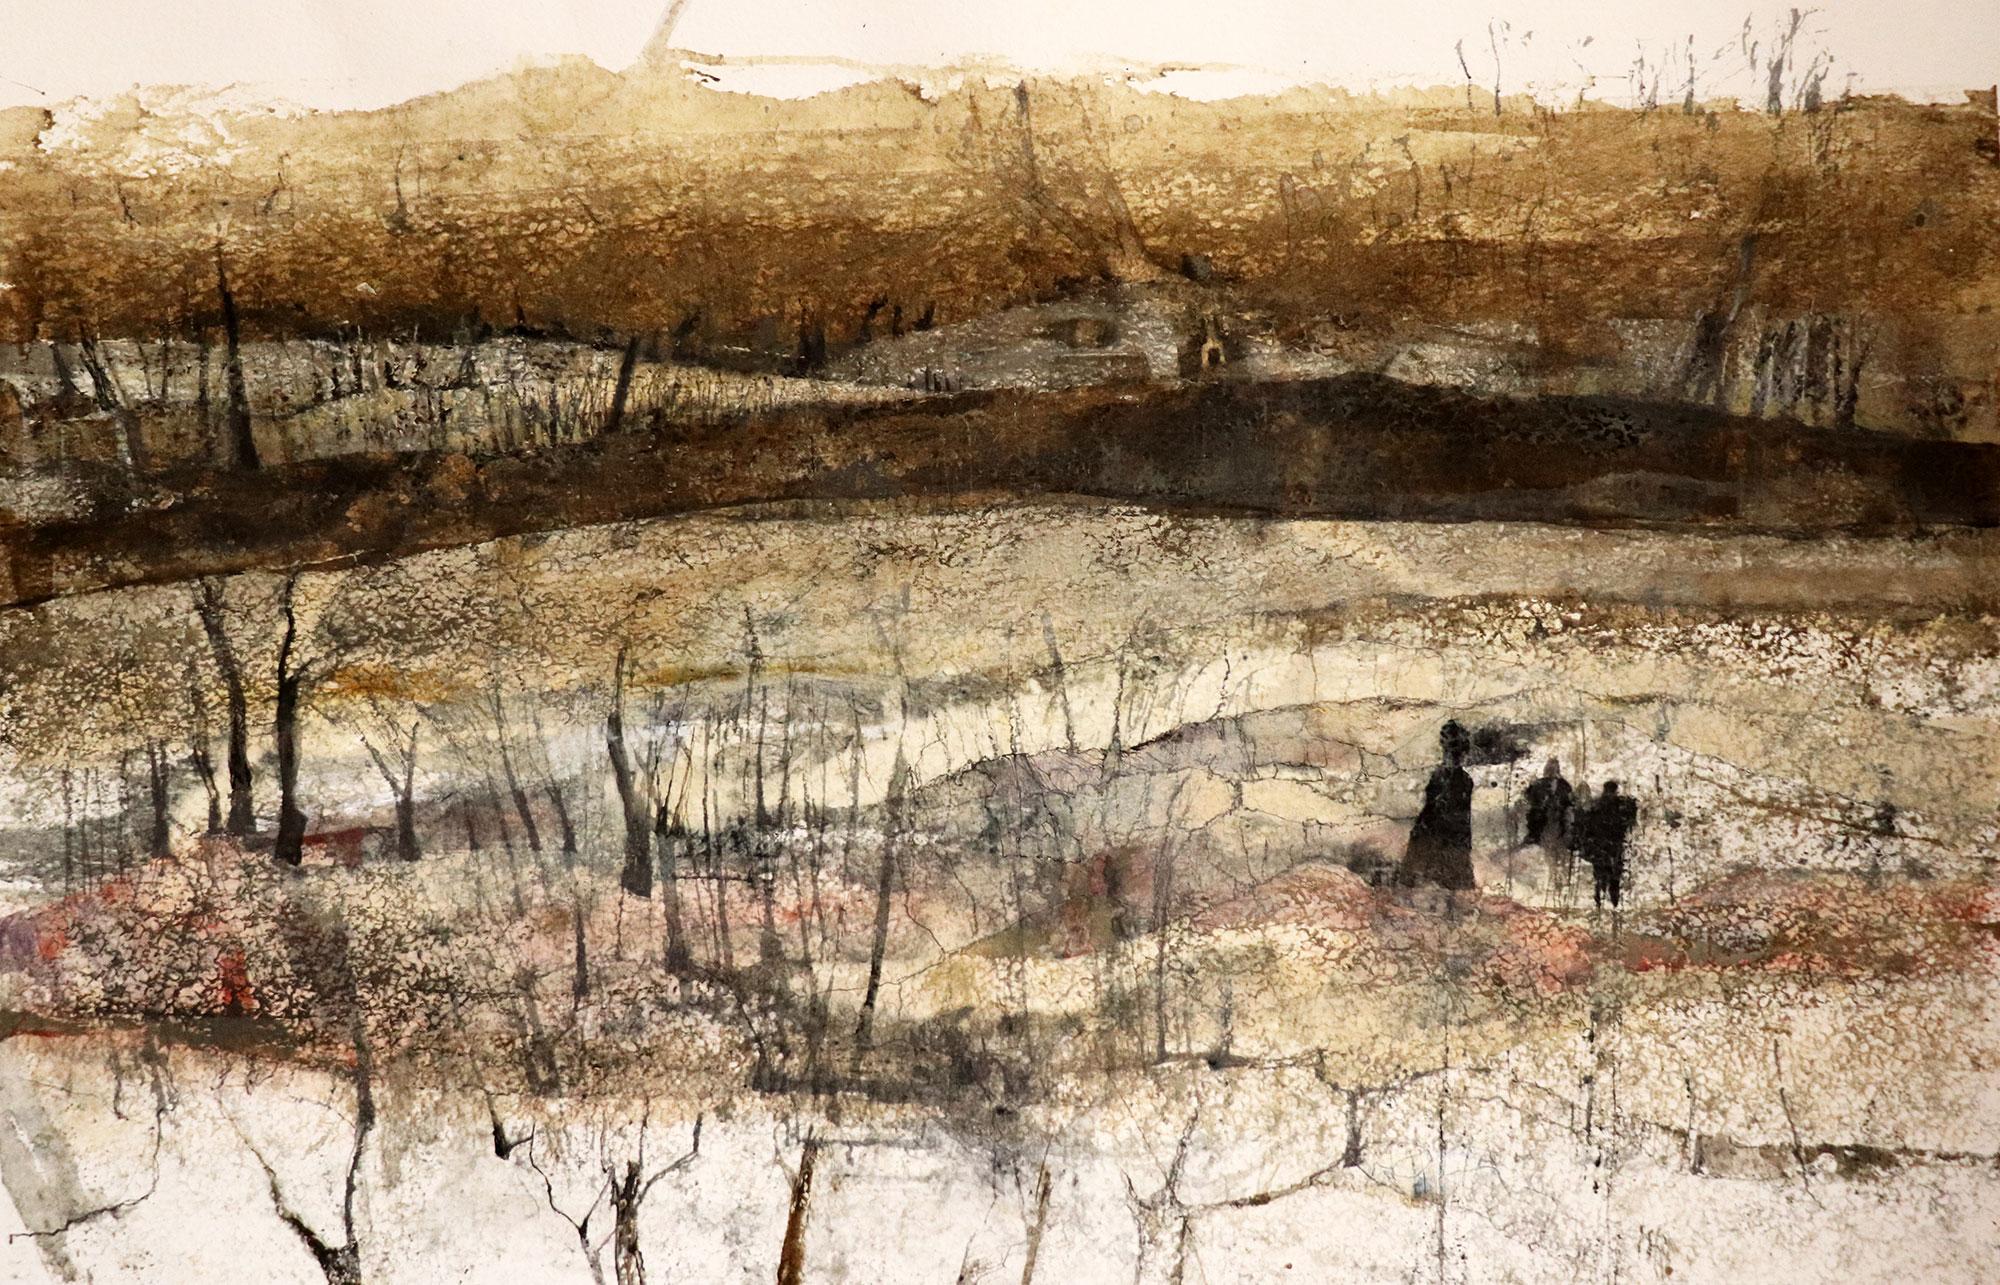 Ruth Thomas, All that remains